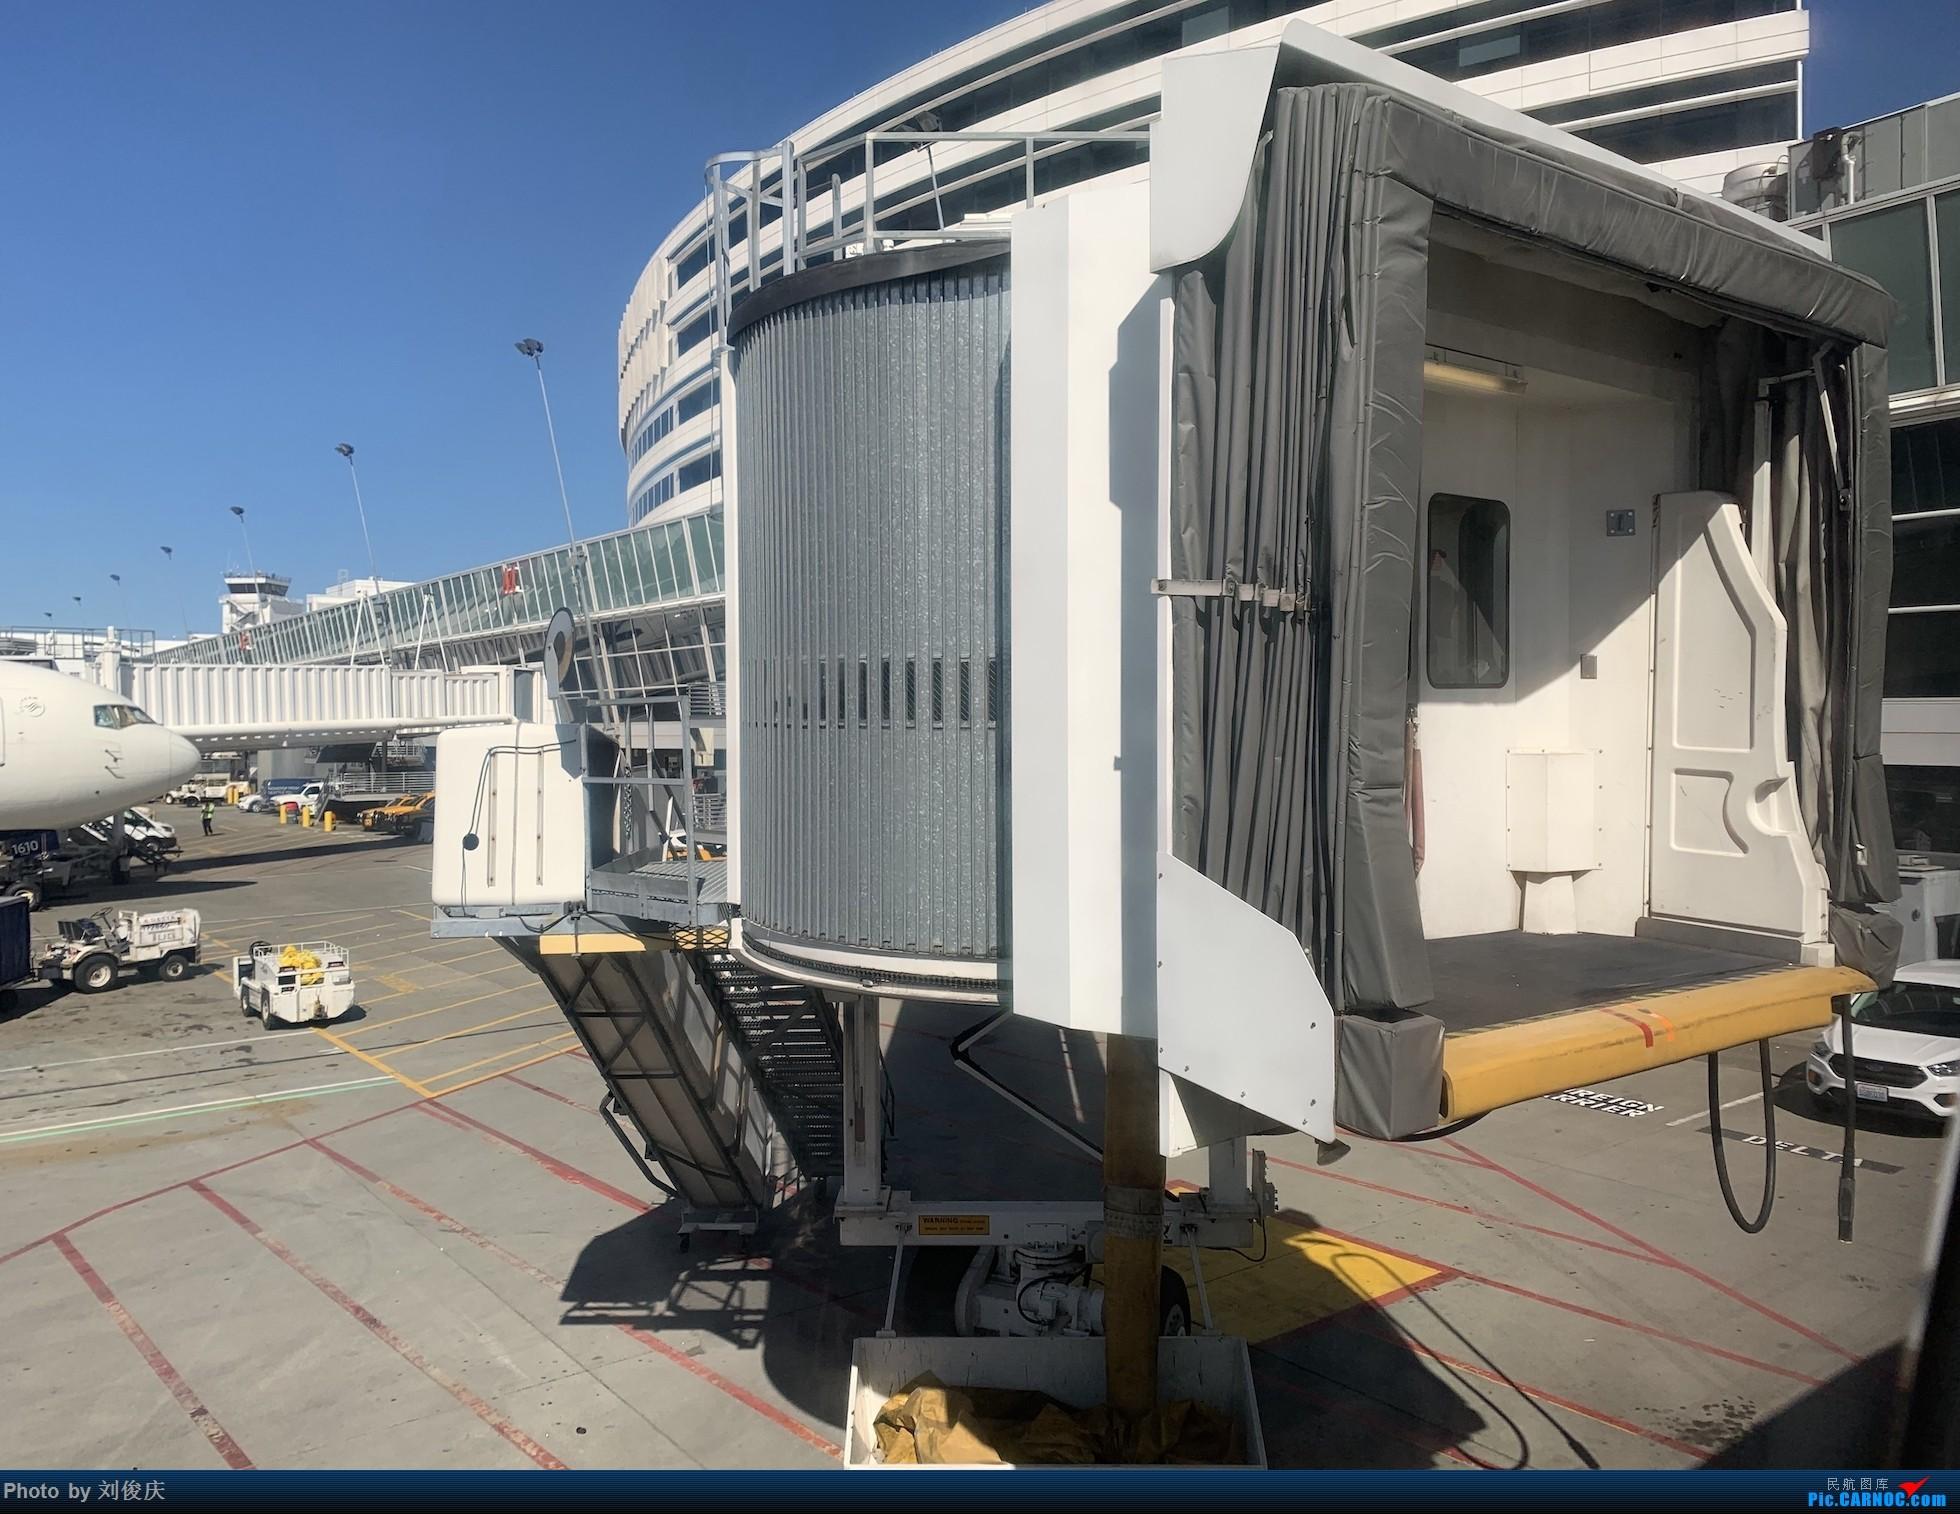 Re:[原创]SEA-LHR-CDG-FCO 8天3国5城暴走游记 SEATTLE TACOMA INTERNATIONAL AIRPORT  SEA